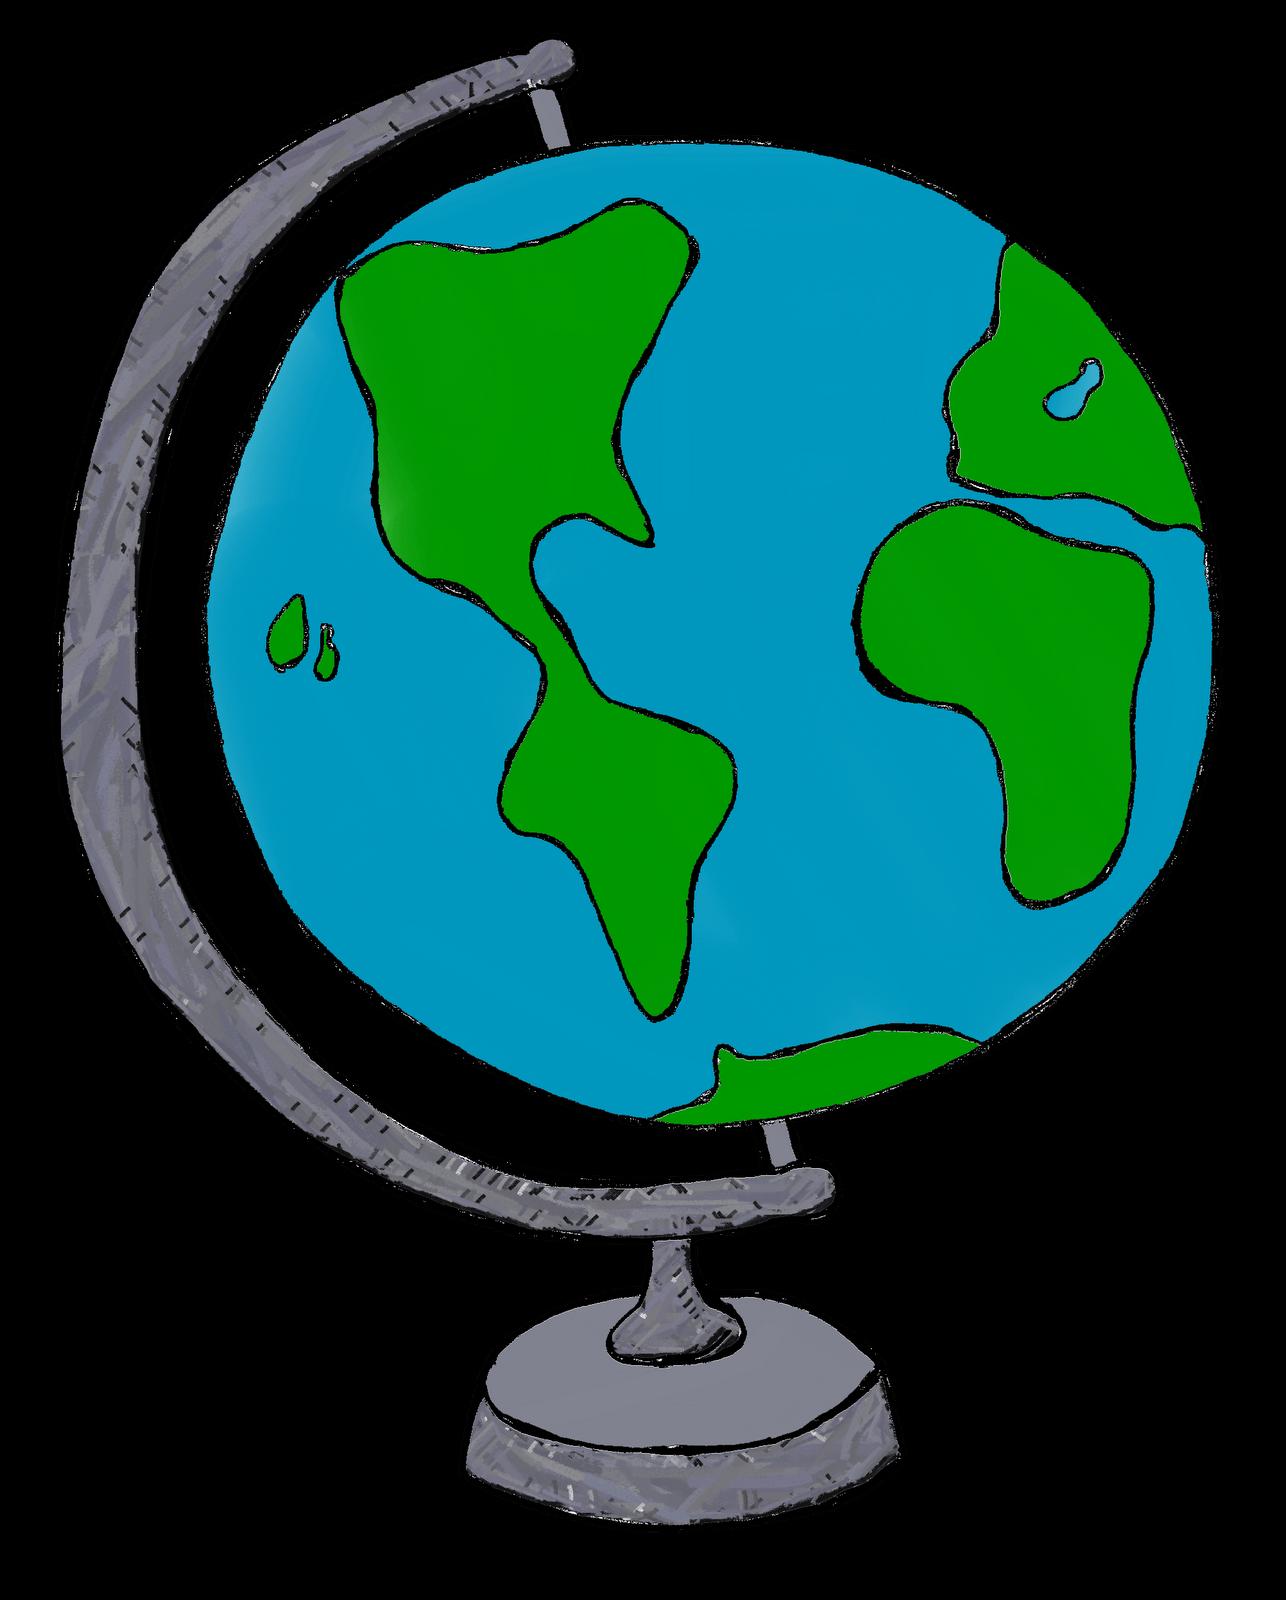 Clipart globe gambar. Cliparts zone